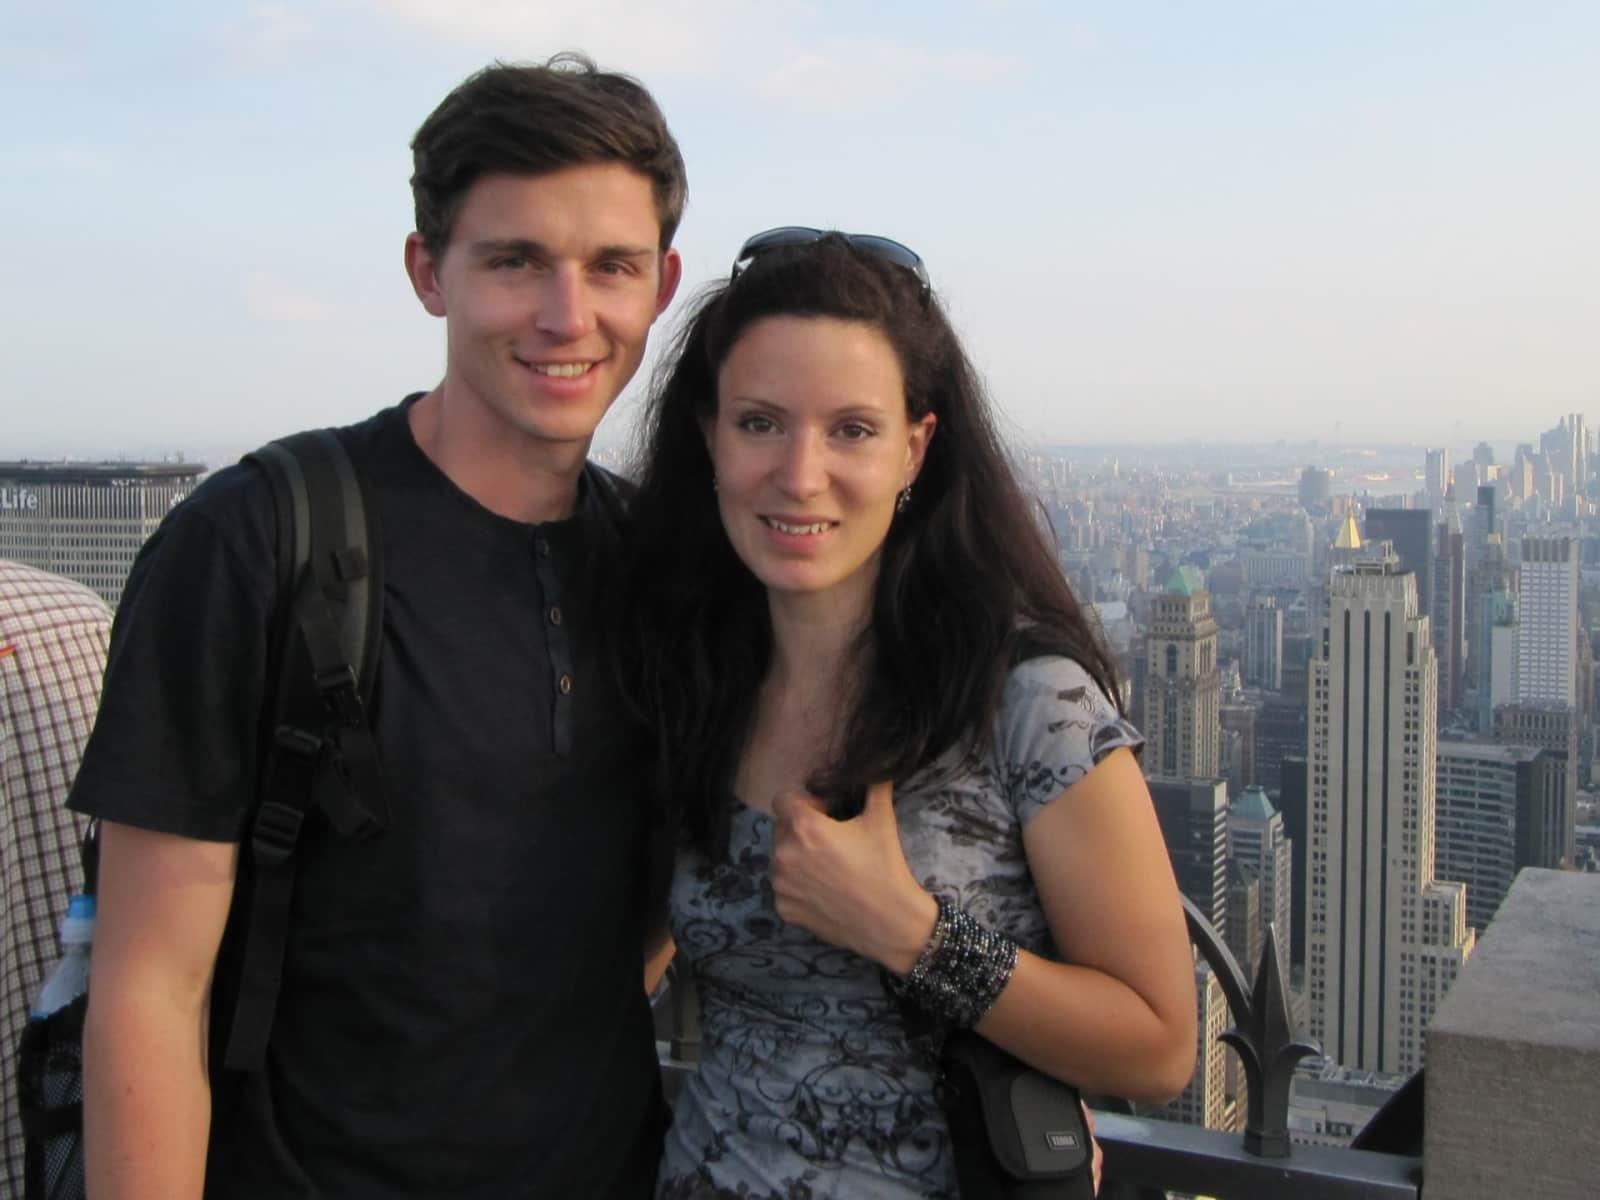 Alma & Thomas from Zug, Switzerland